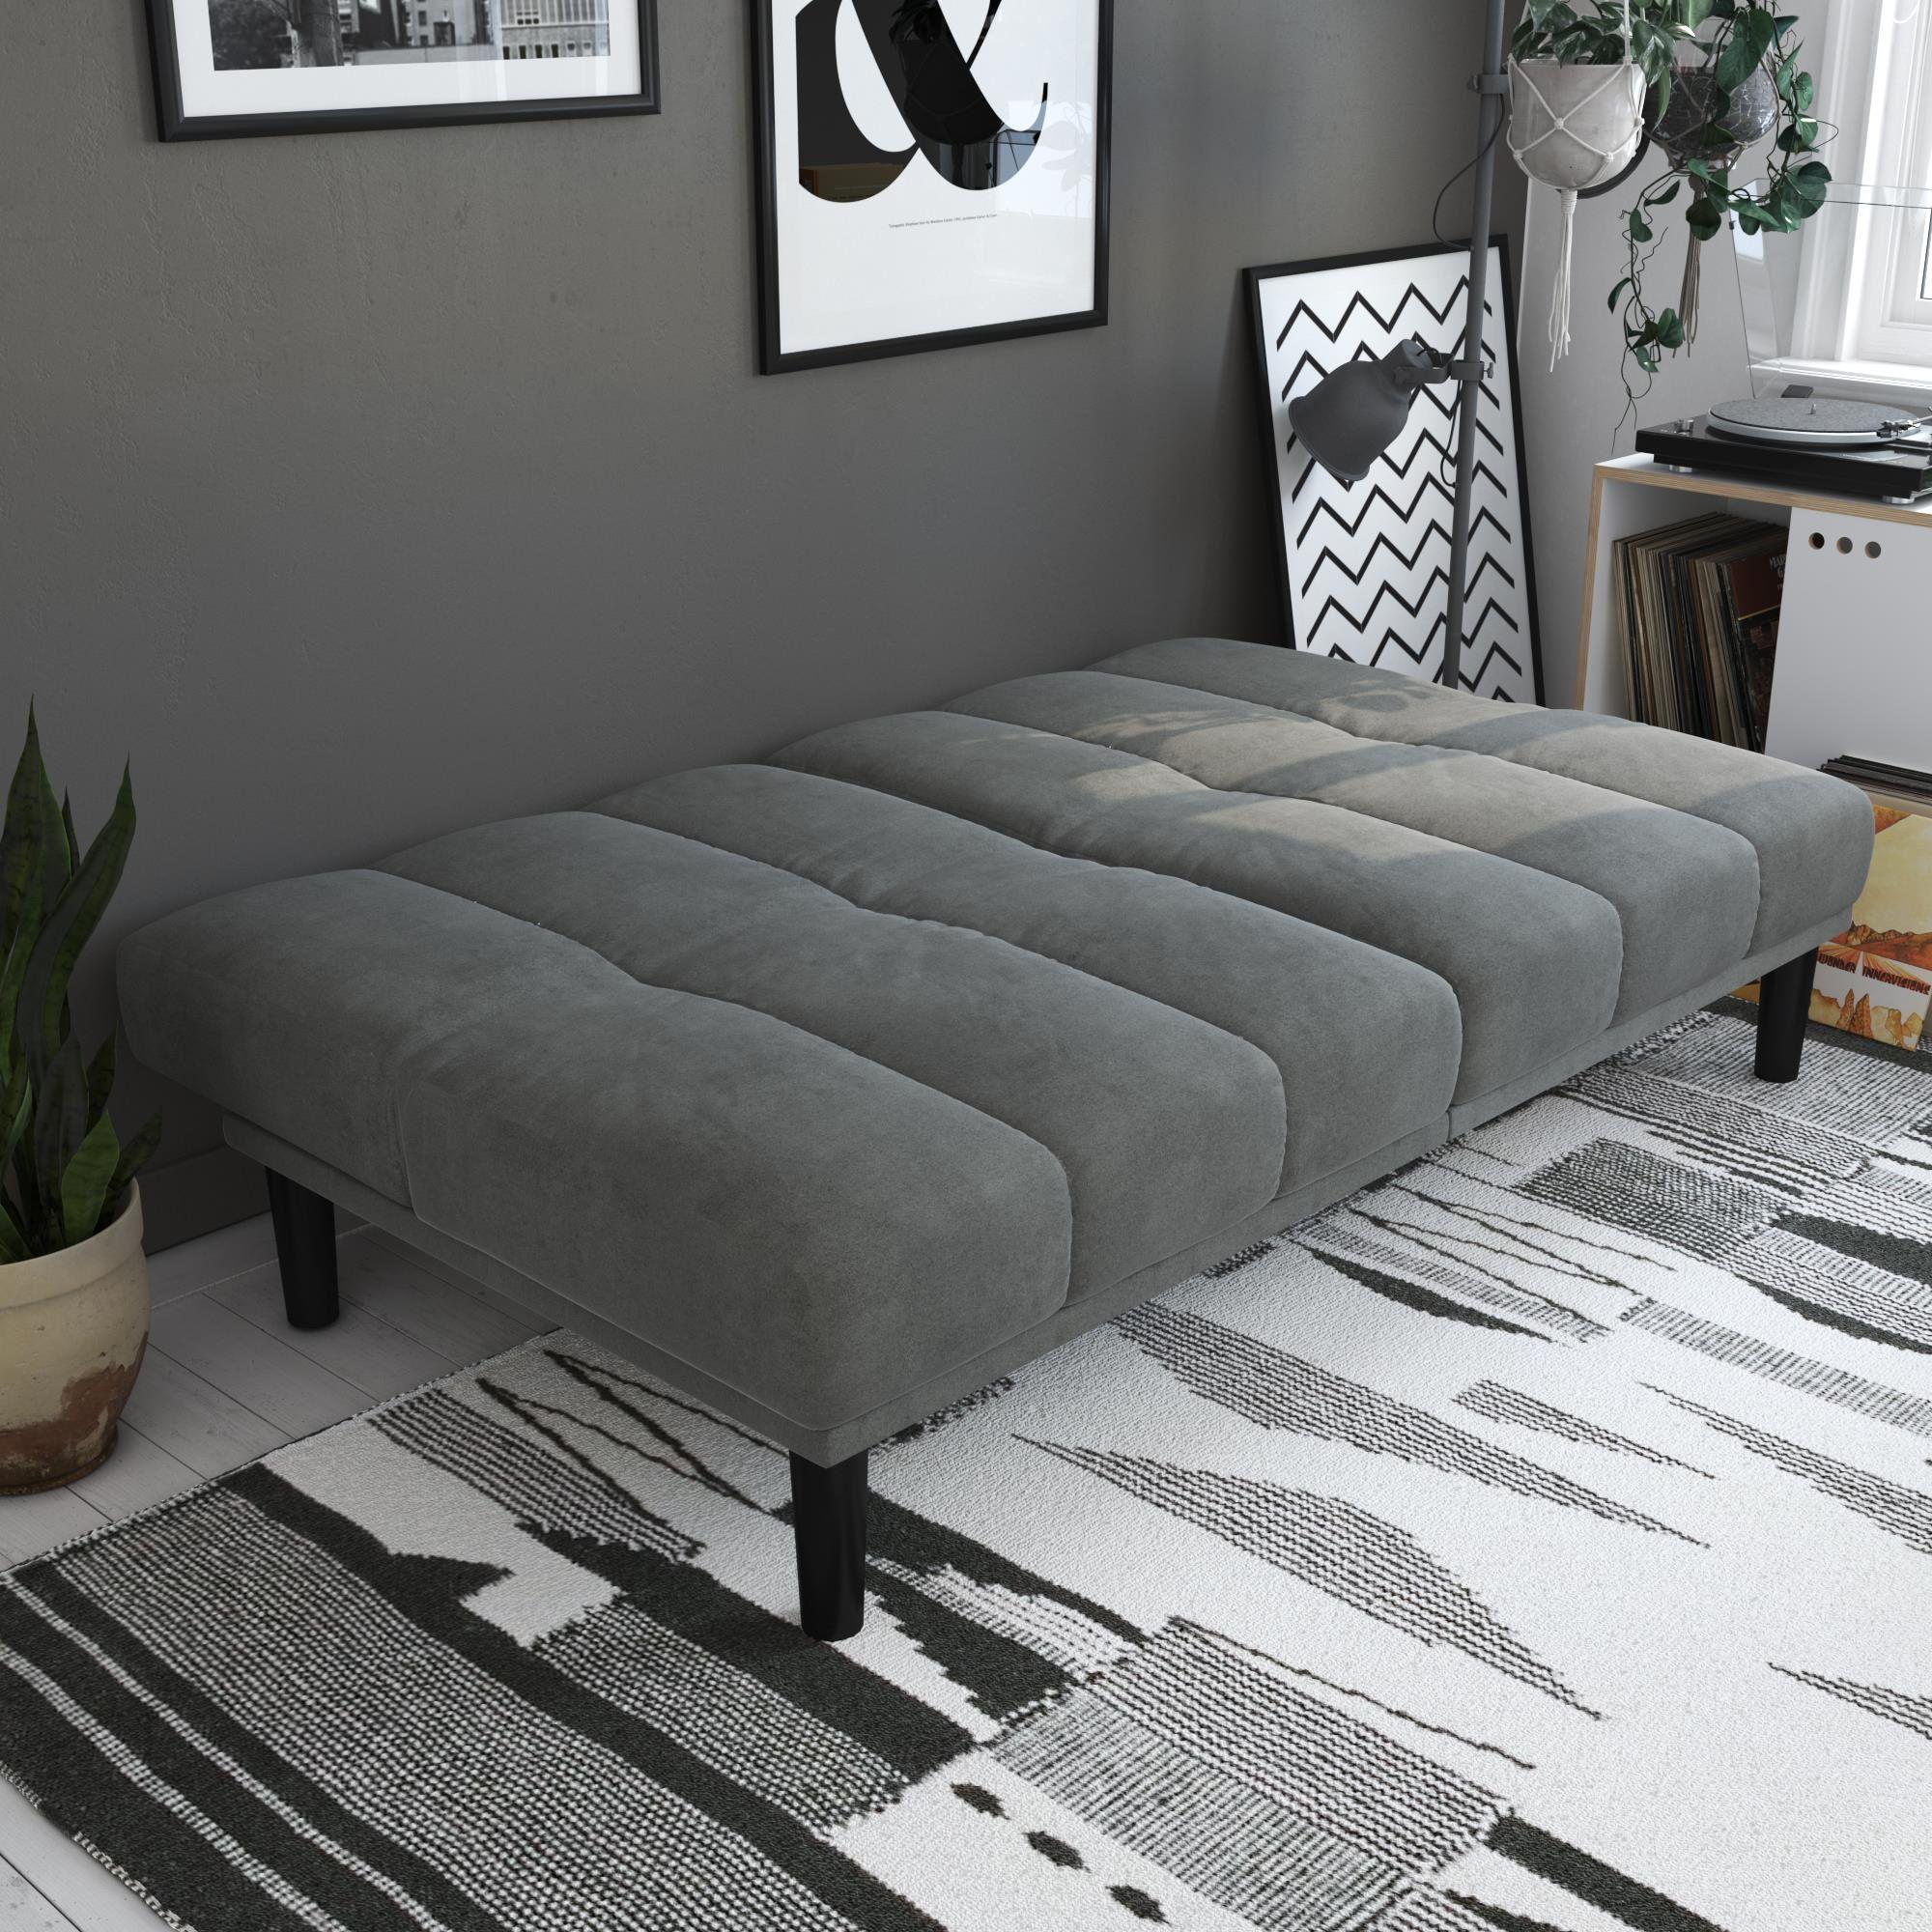 Mainstays Channel Cushion Futon Gray Walmart Com Bedroom Decor Design Futon Small Space Living Futon decorating living room